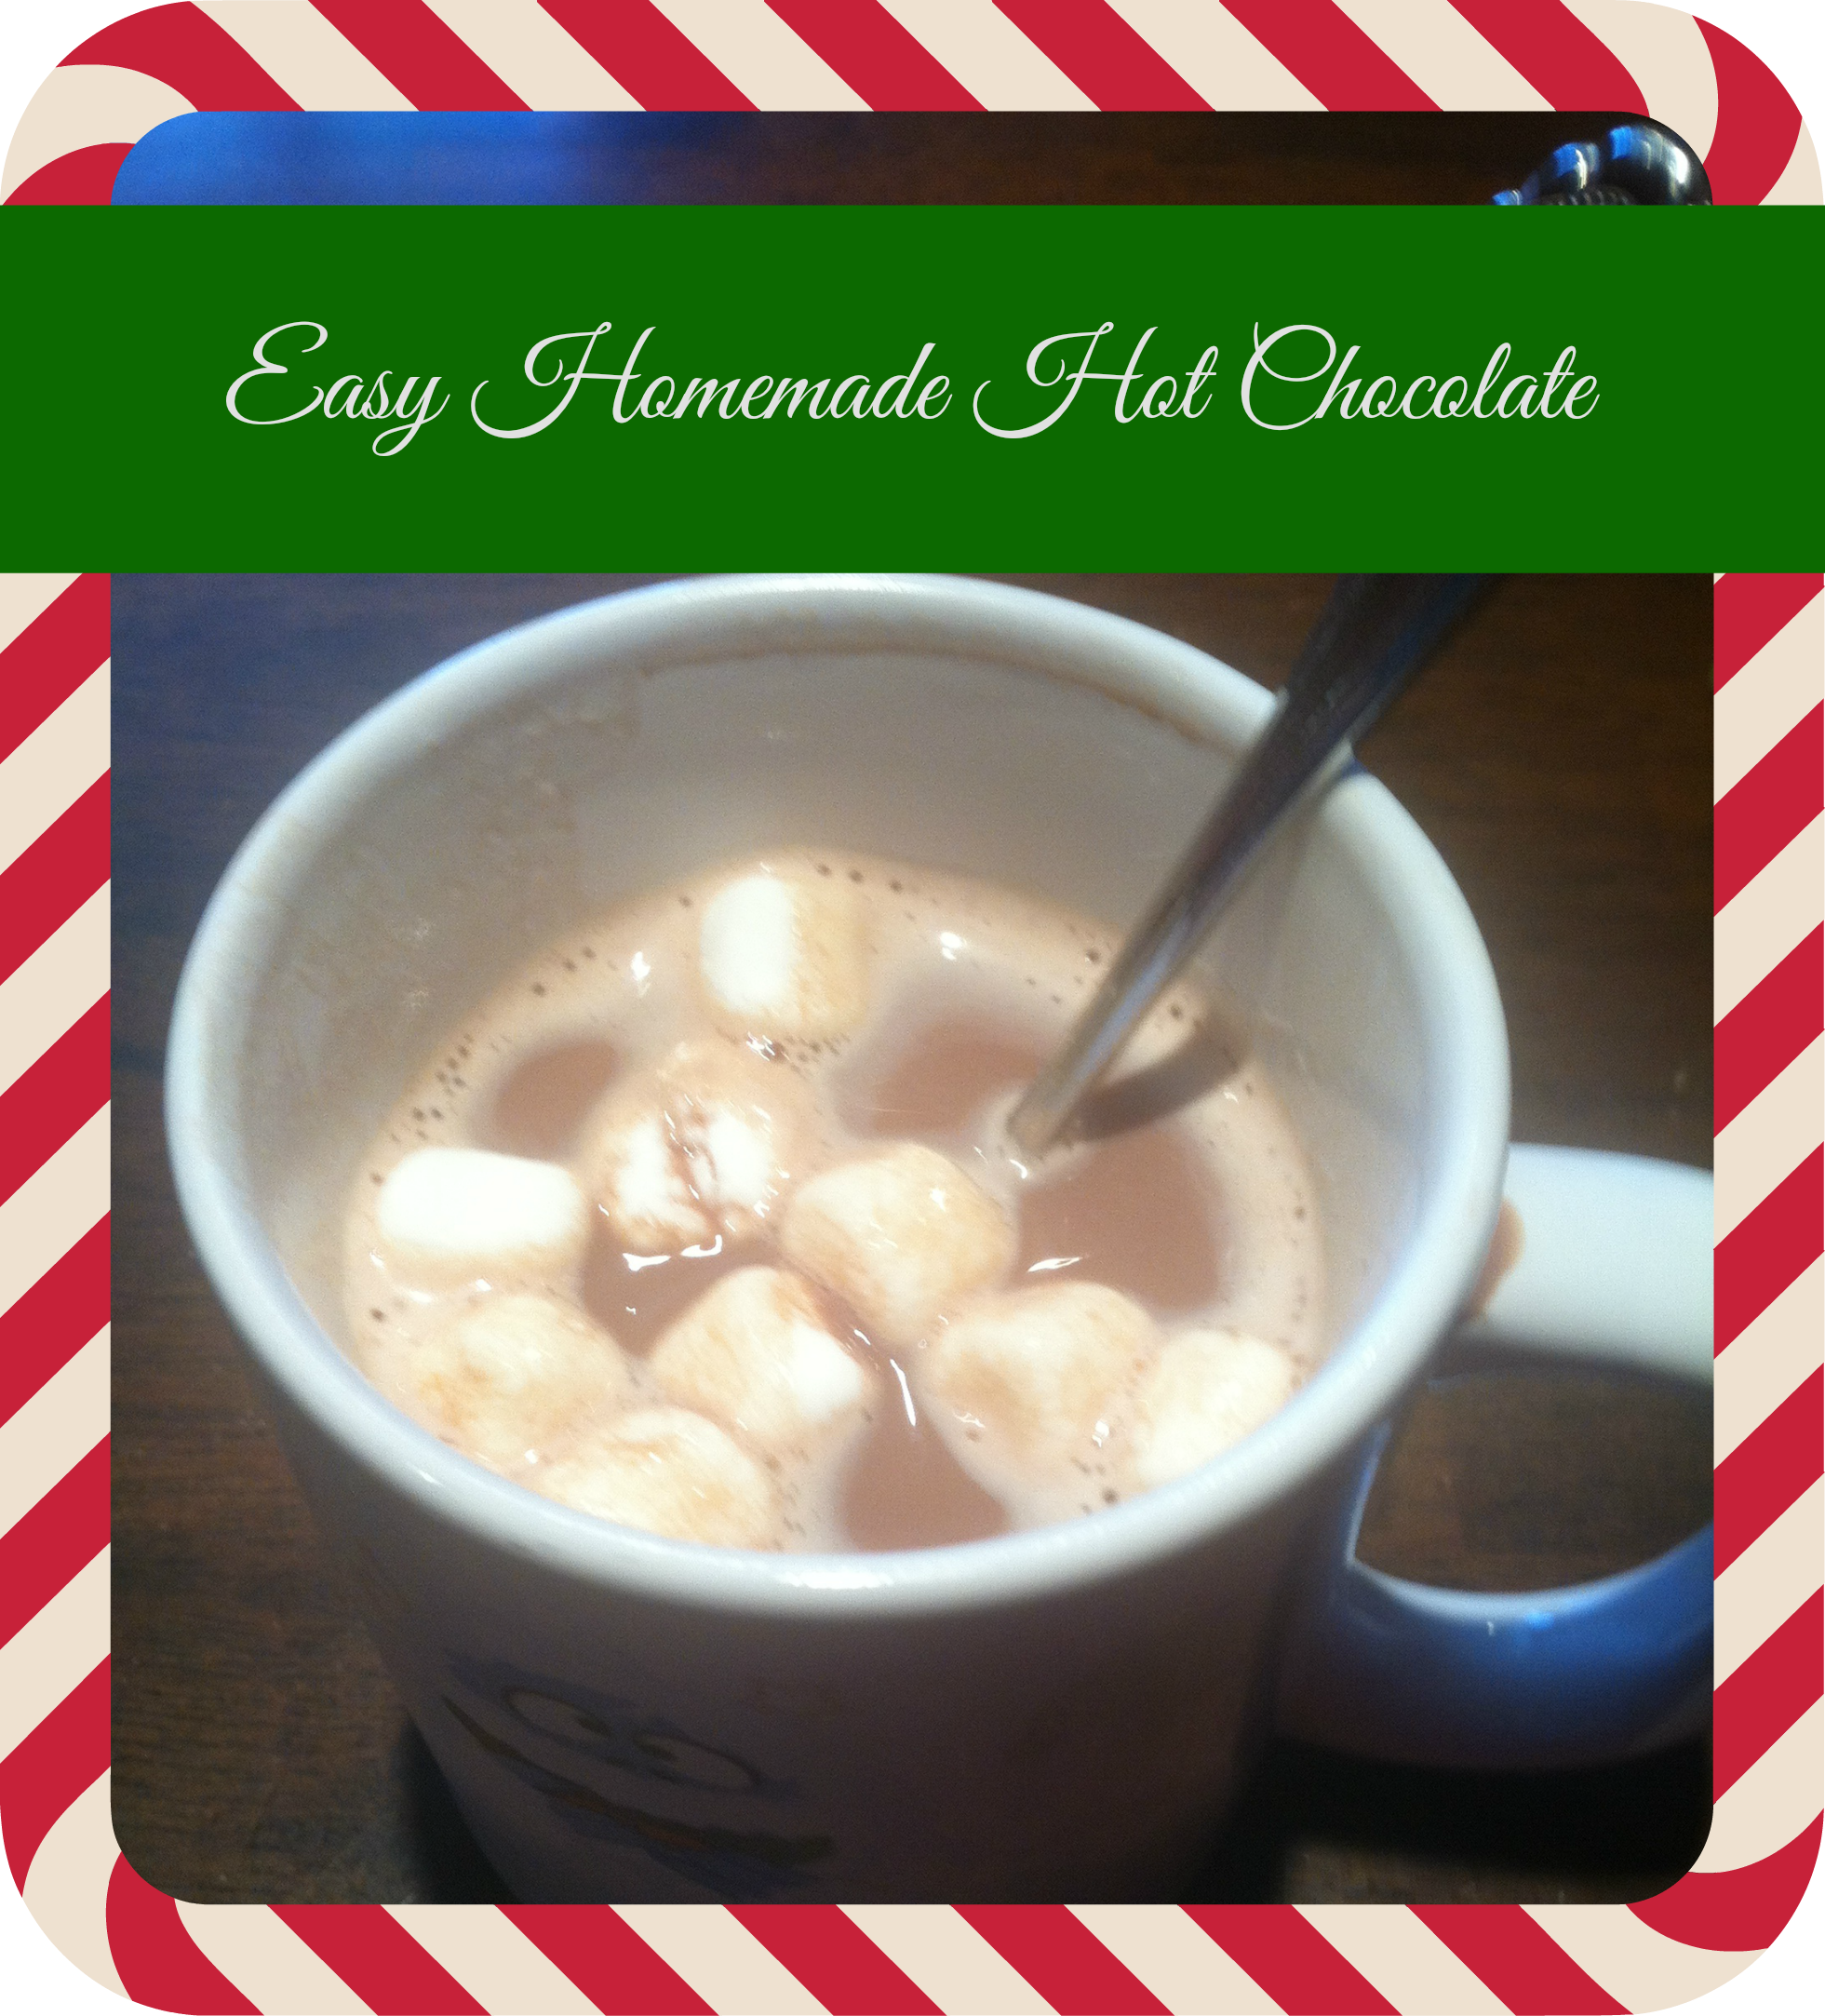 Easy Homemade Hot Chocolate